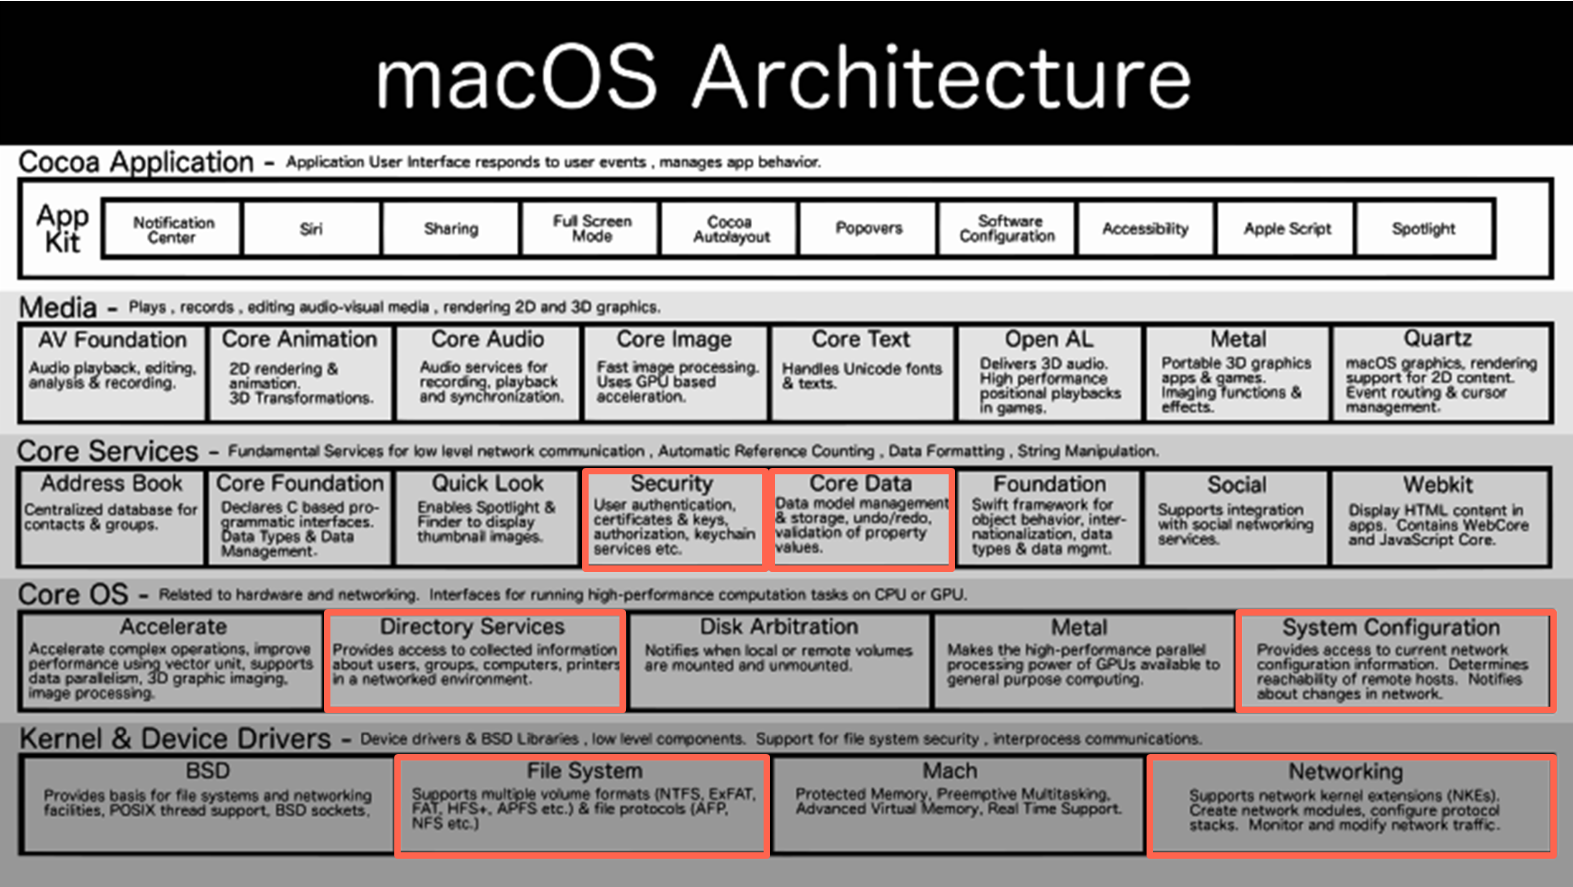 Pentest Enumiration for macOS